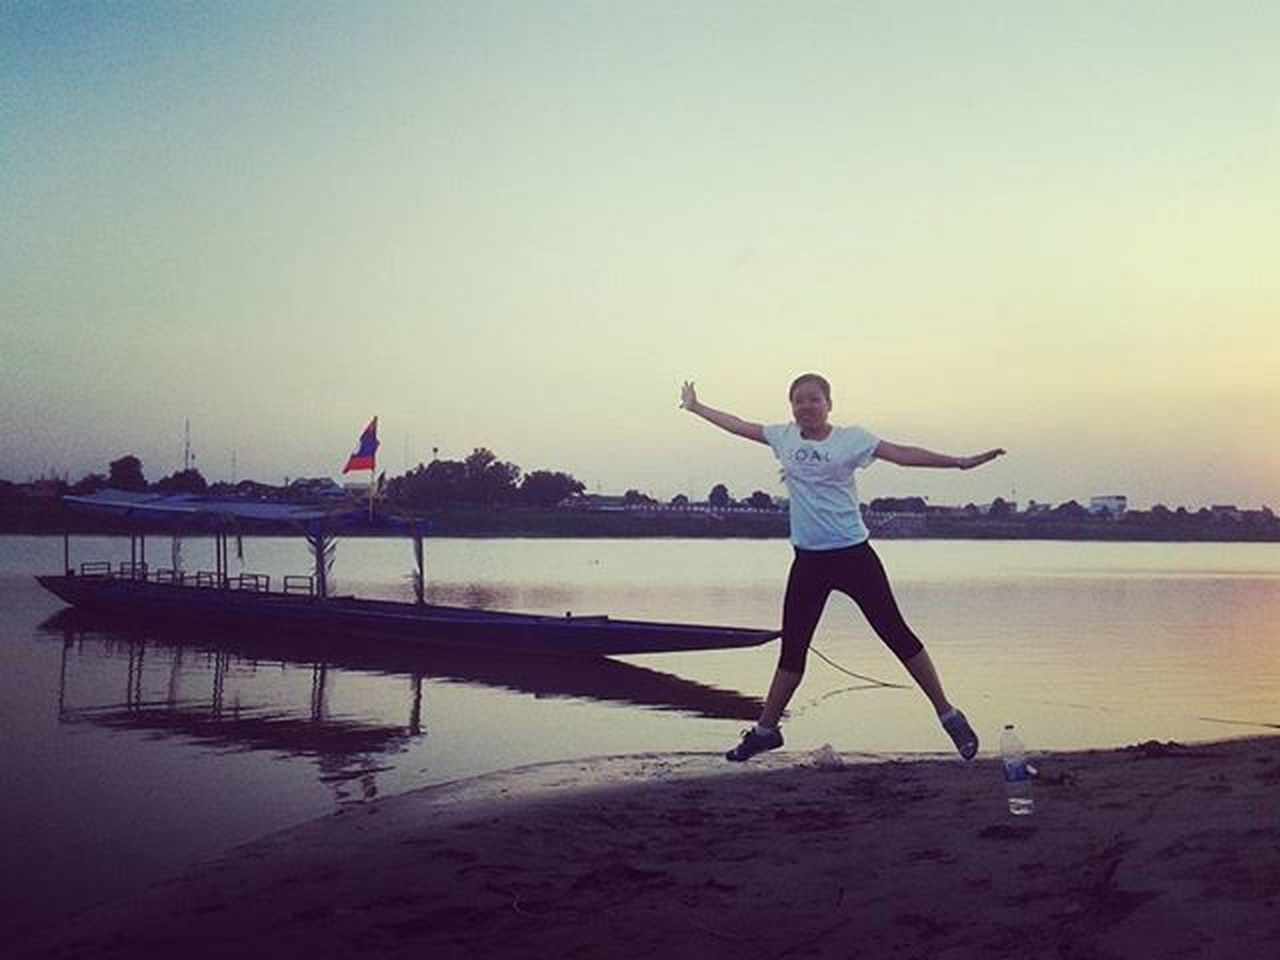 Fun Funatthemekong Flying Starjumps Exercise Sexylaogirl SexyAsian Sunsetonthemekong River Boat Shadow Silhouette Vientiane Laos Southeastasia Lifeasiseeit Johnnelson